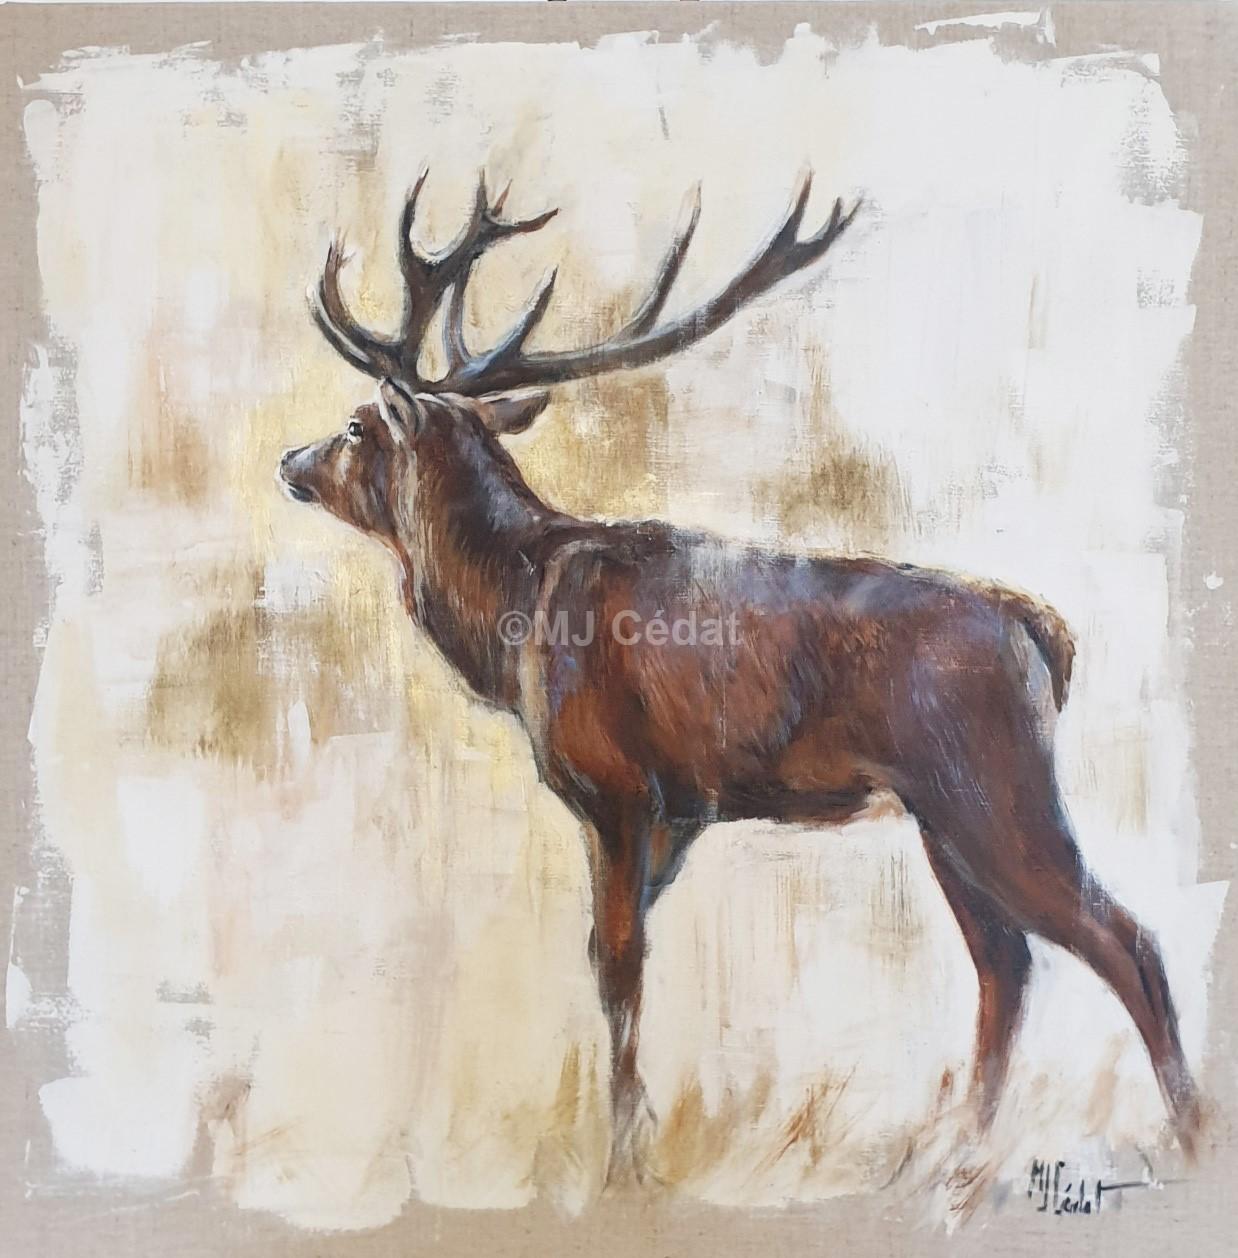 Galerie De Peinture Europe Marie Joelle Cedat Artiste Animalier